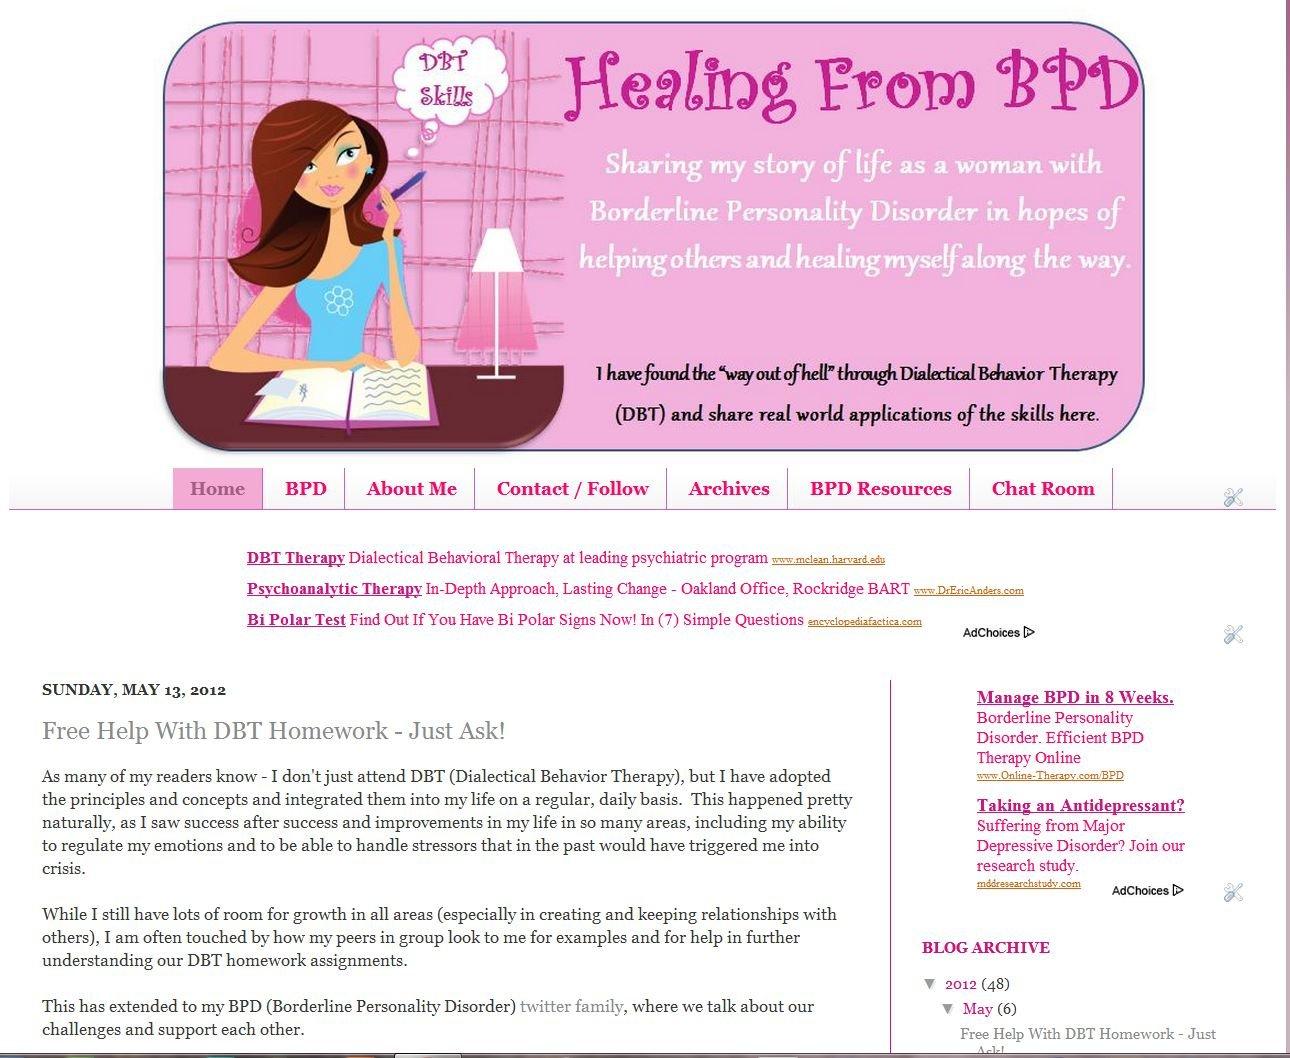 Amazon.com: Healing From BPD (Borderline Personality ...